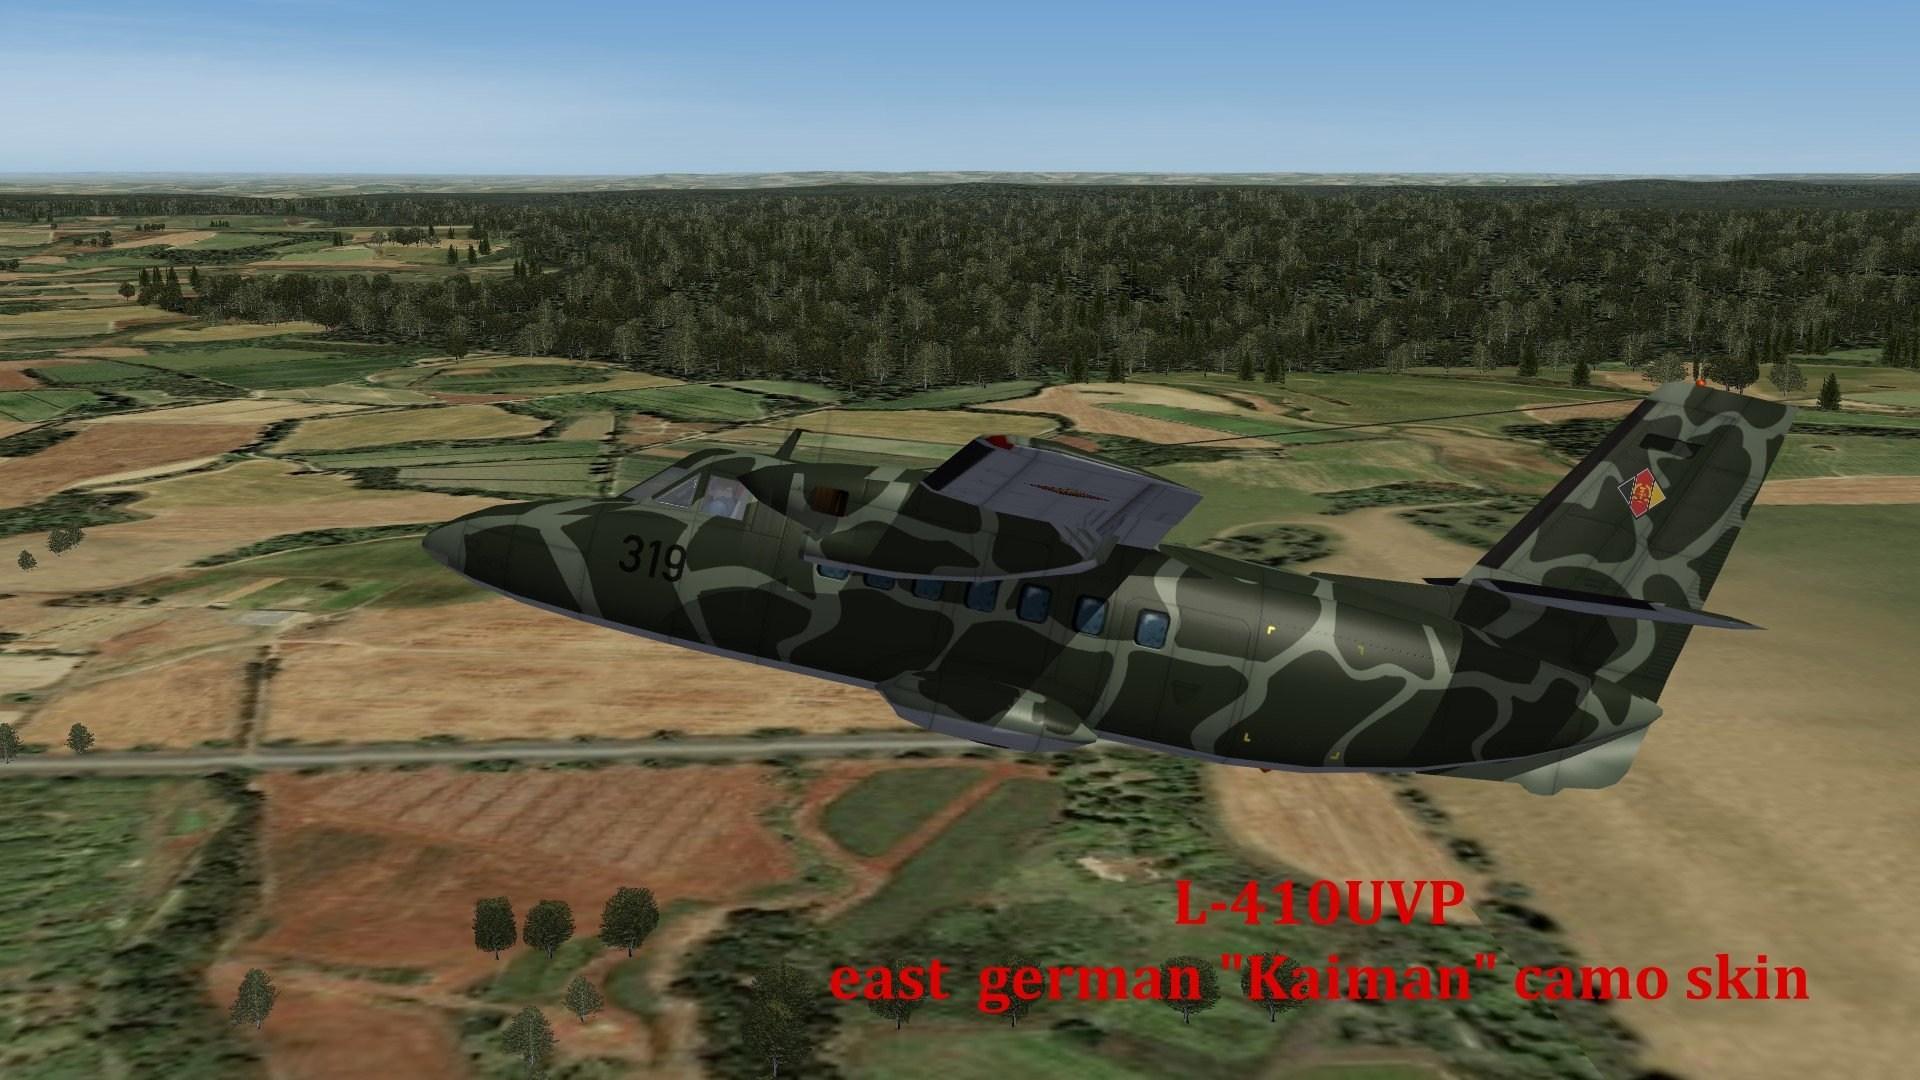 L-410UVP Kaiman camo skin